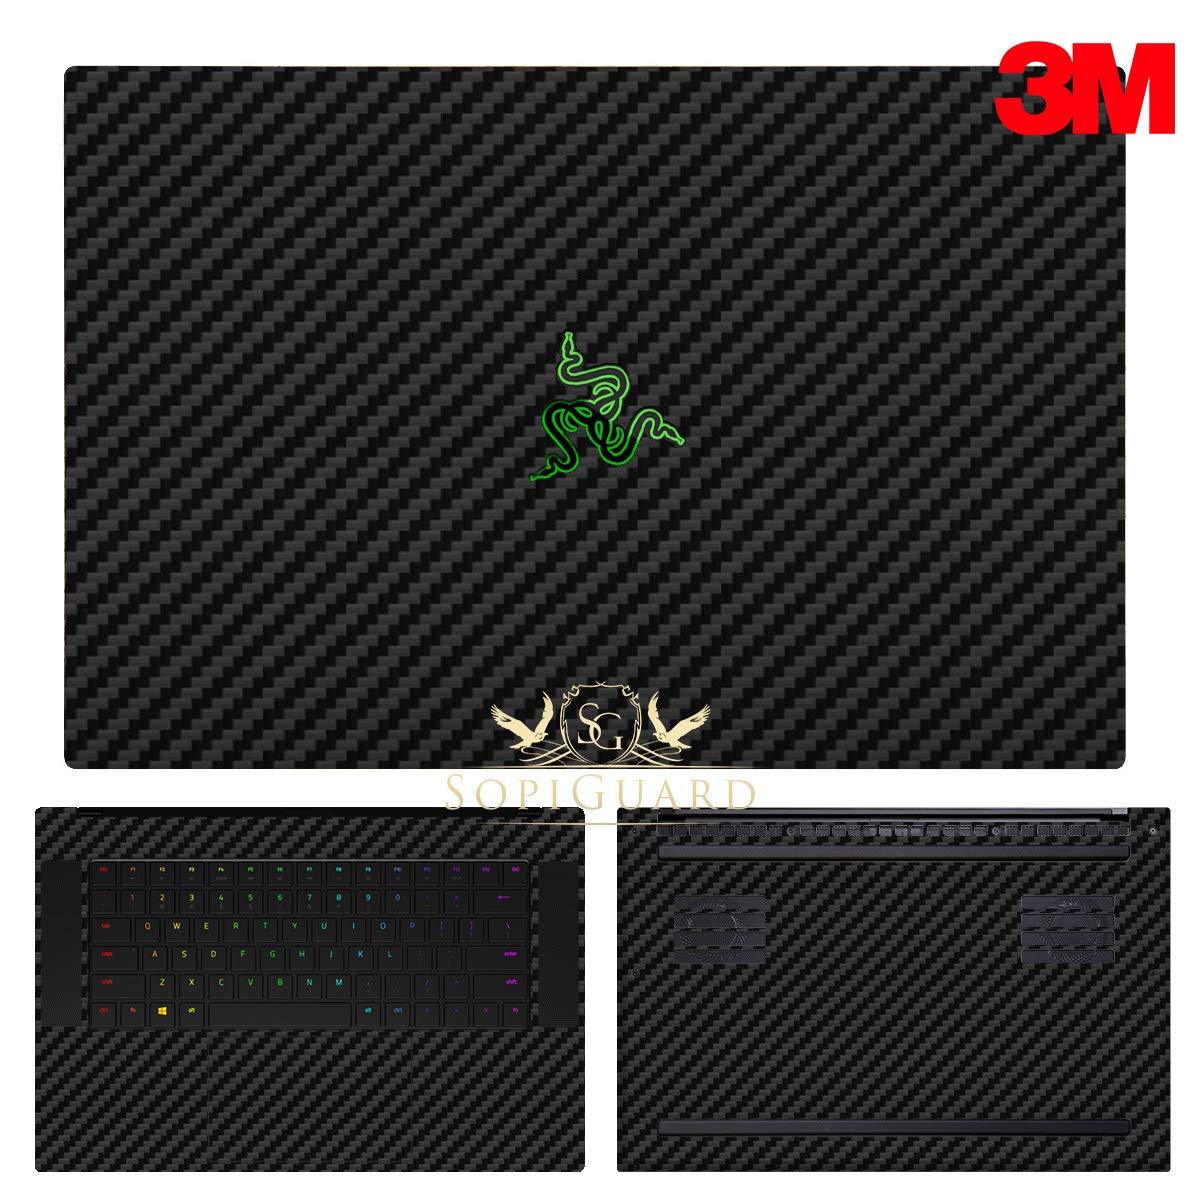 SopiGuard 3M Black Carbon Full Body Precision Edge-to-Edge Coverage Vinyl Sticker Skin for 2018 Razer Blade 15.6 inch (Base Model)